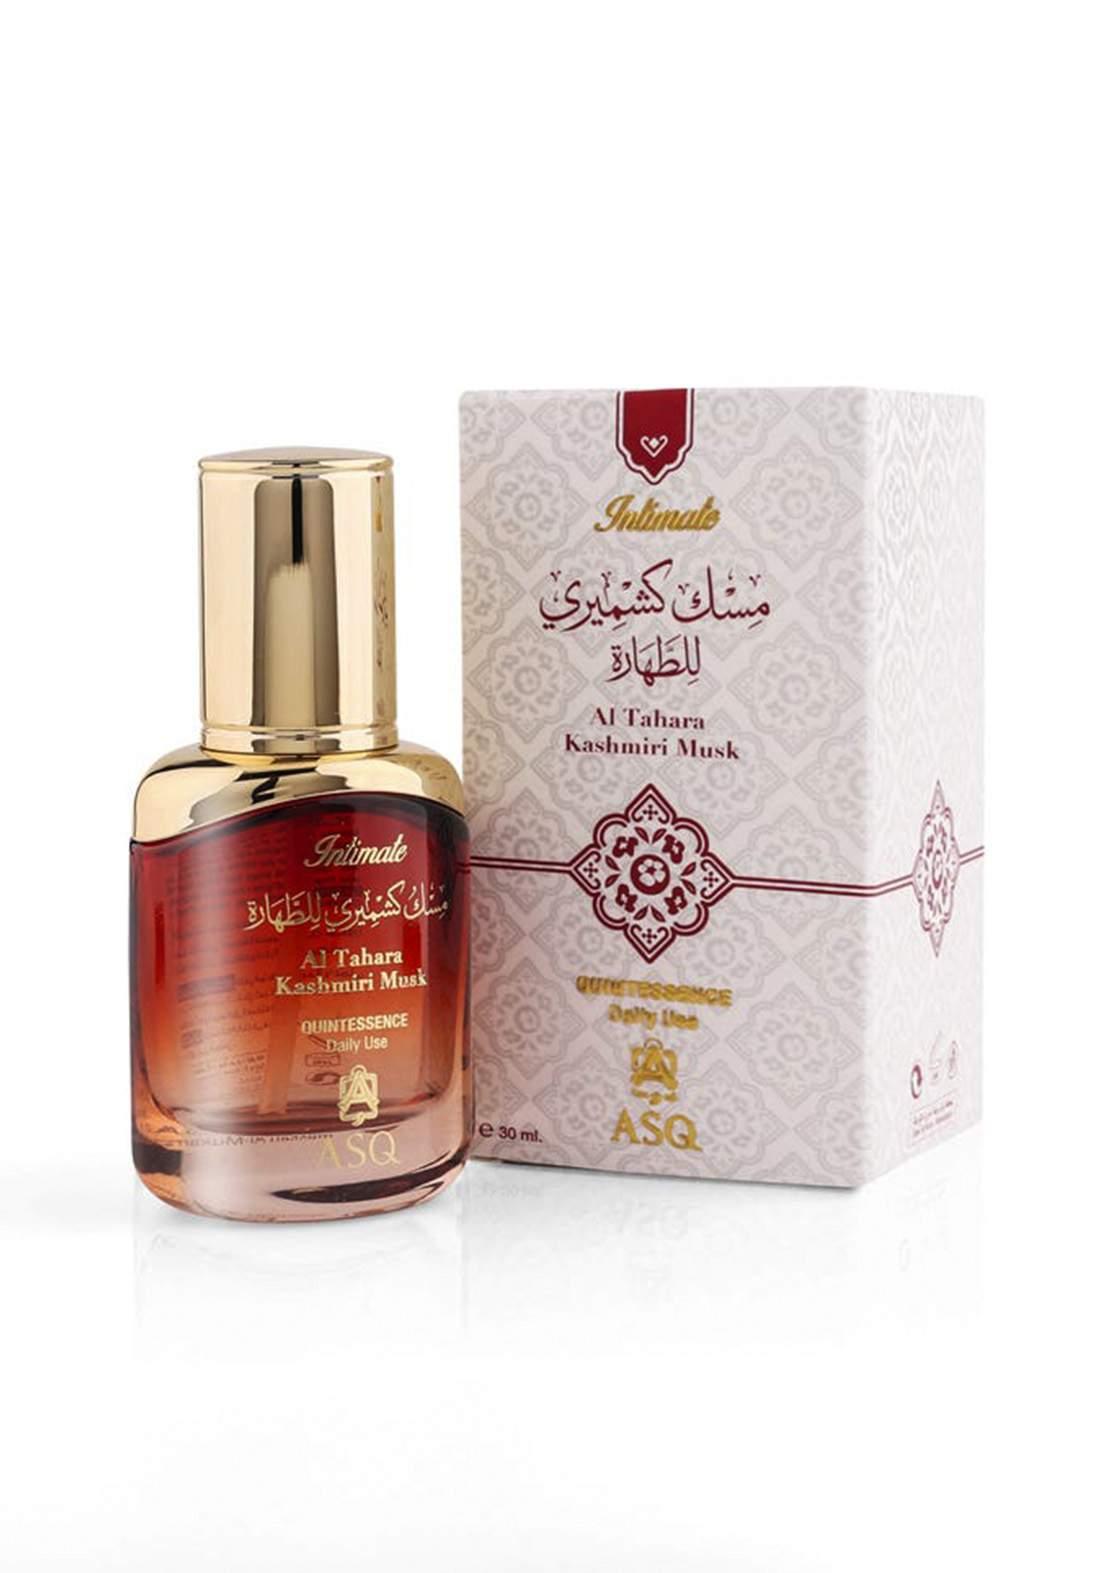 Abdul Samad Al Qurashi 72136 Tahara Kashmiri Musk  Quintessence  30 ml  عطر زيتي  نسائي